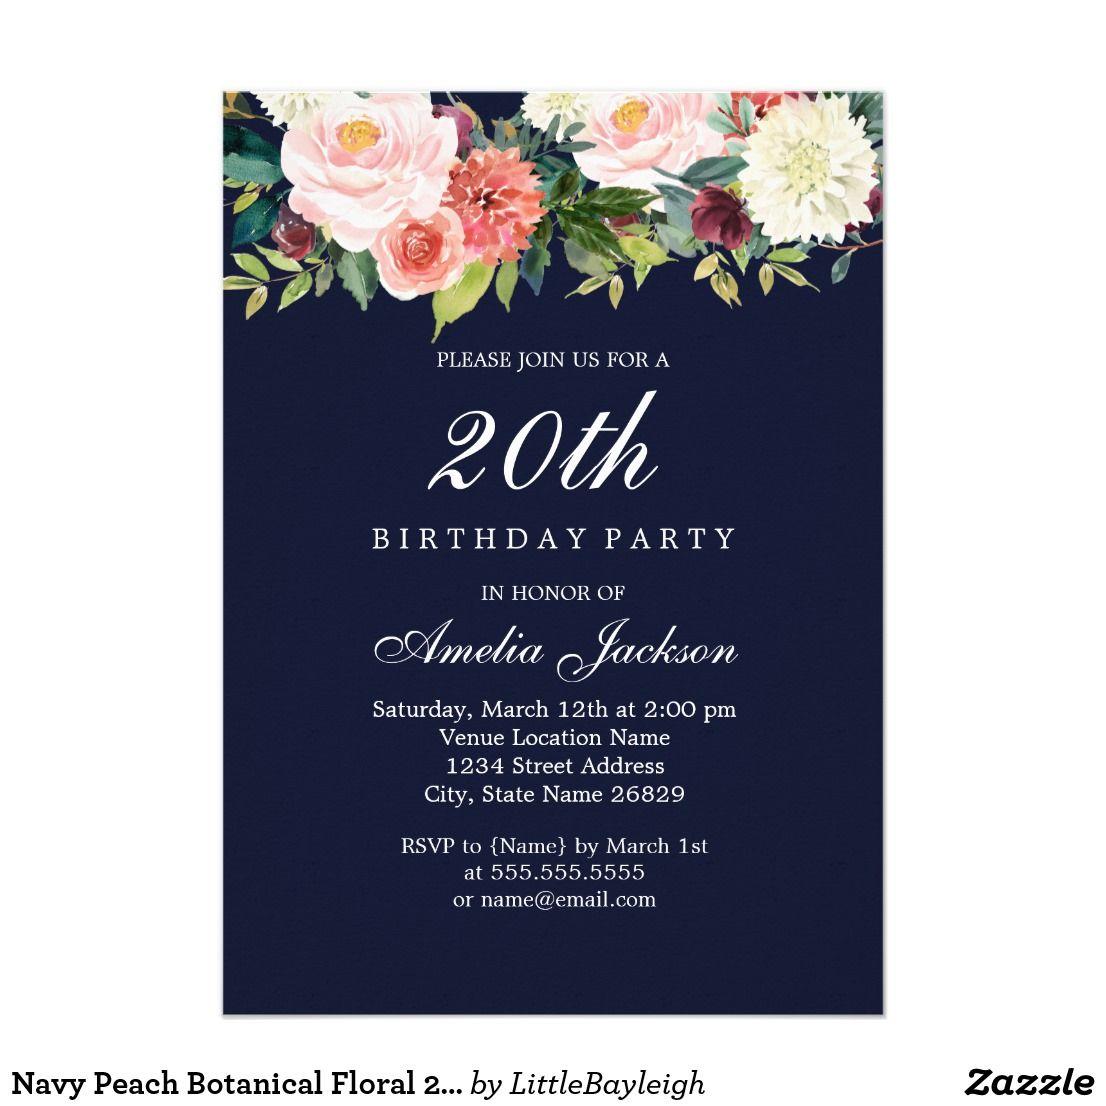 Navy Peach Botanical Floral 20th Birthday Card